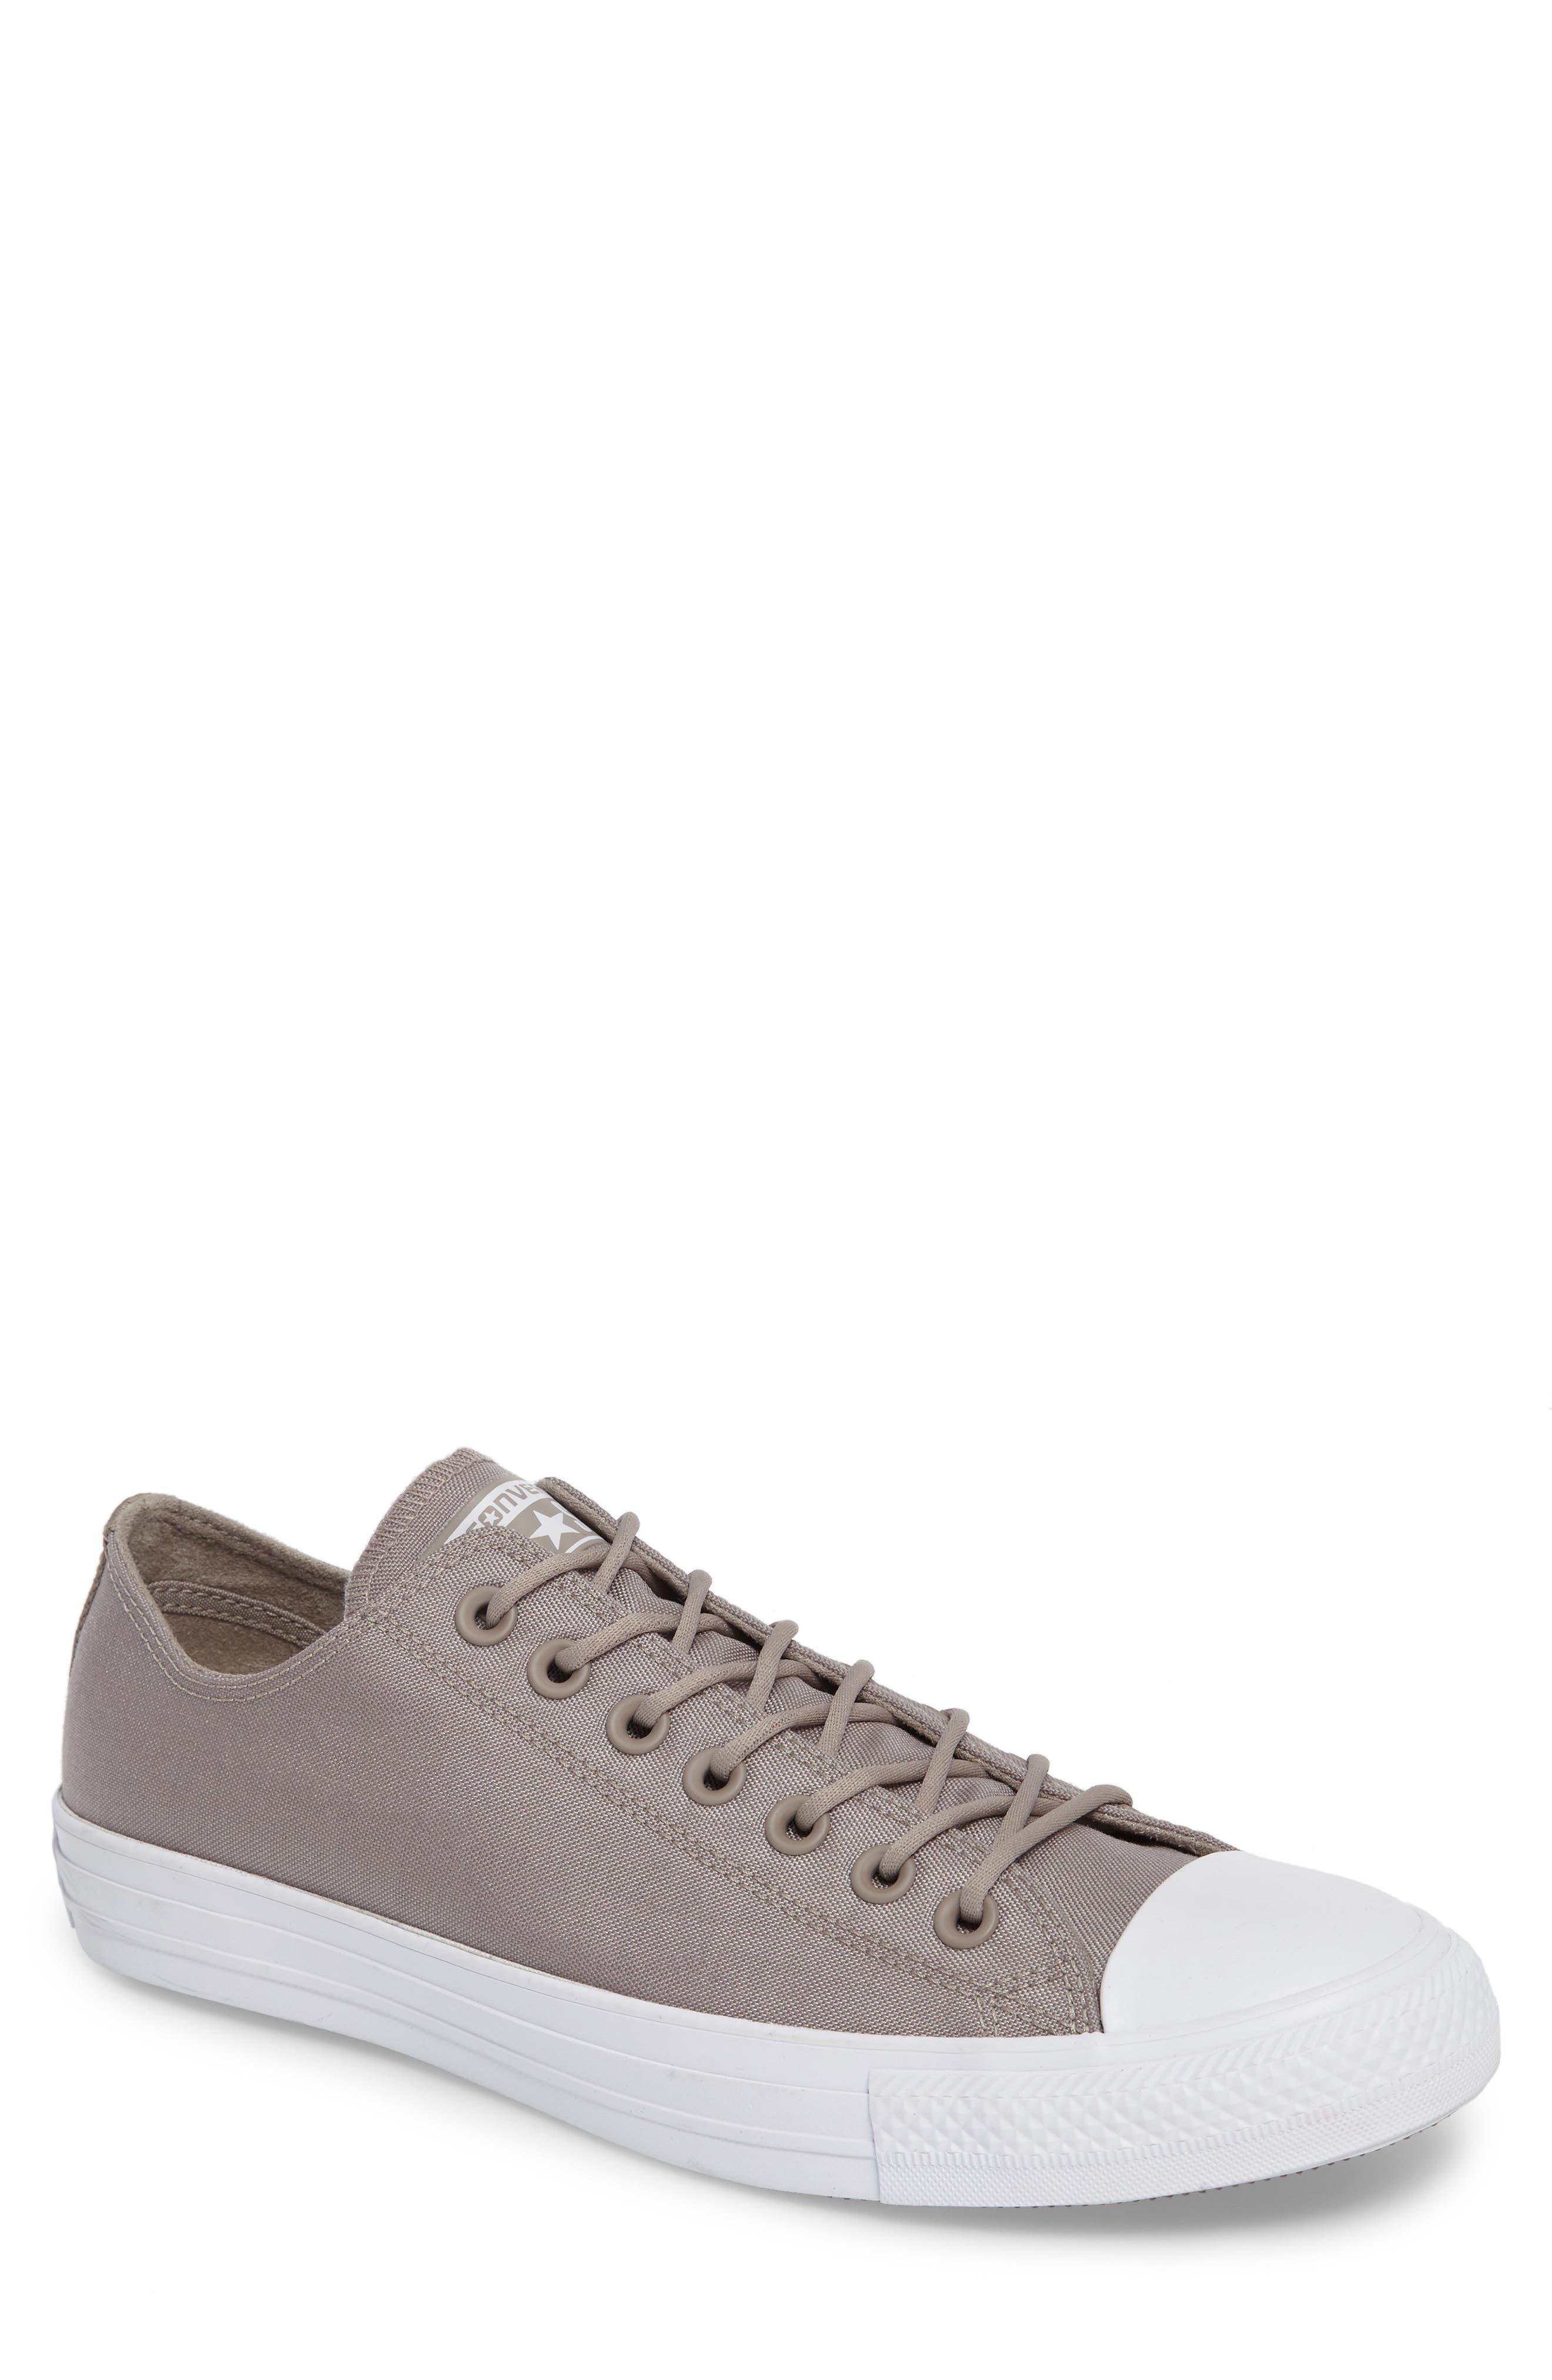 Main Image - Converse Chuck Taylor® All Star® Ox Sneaker (Men)